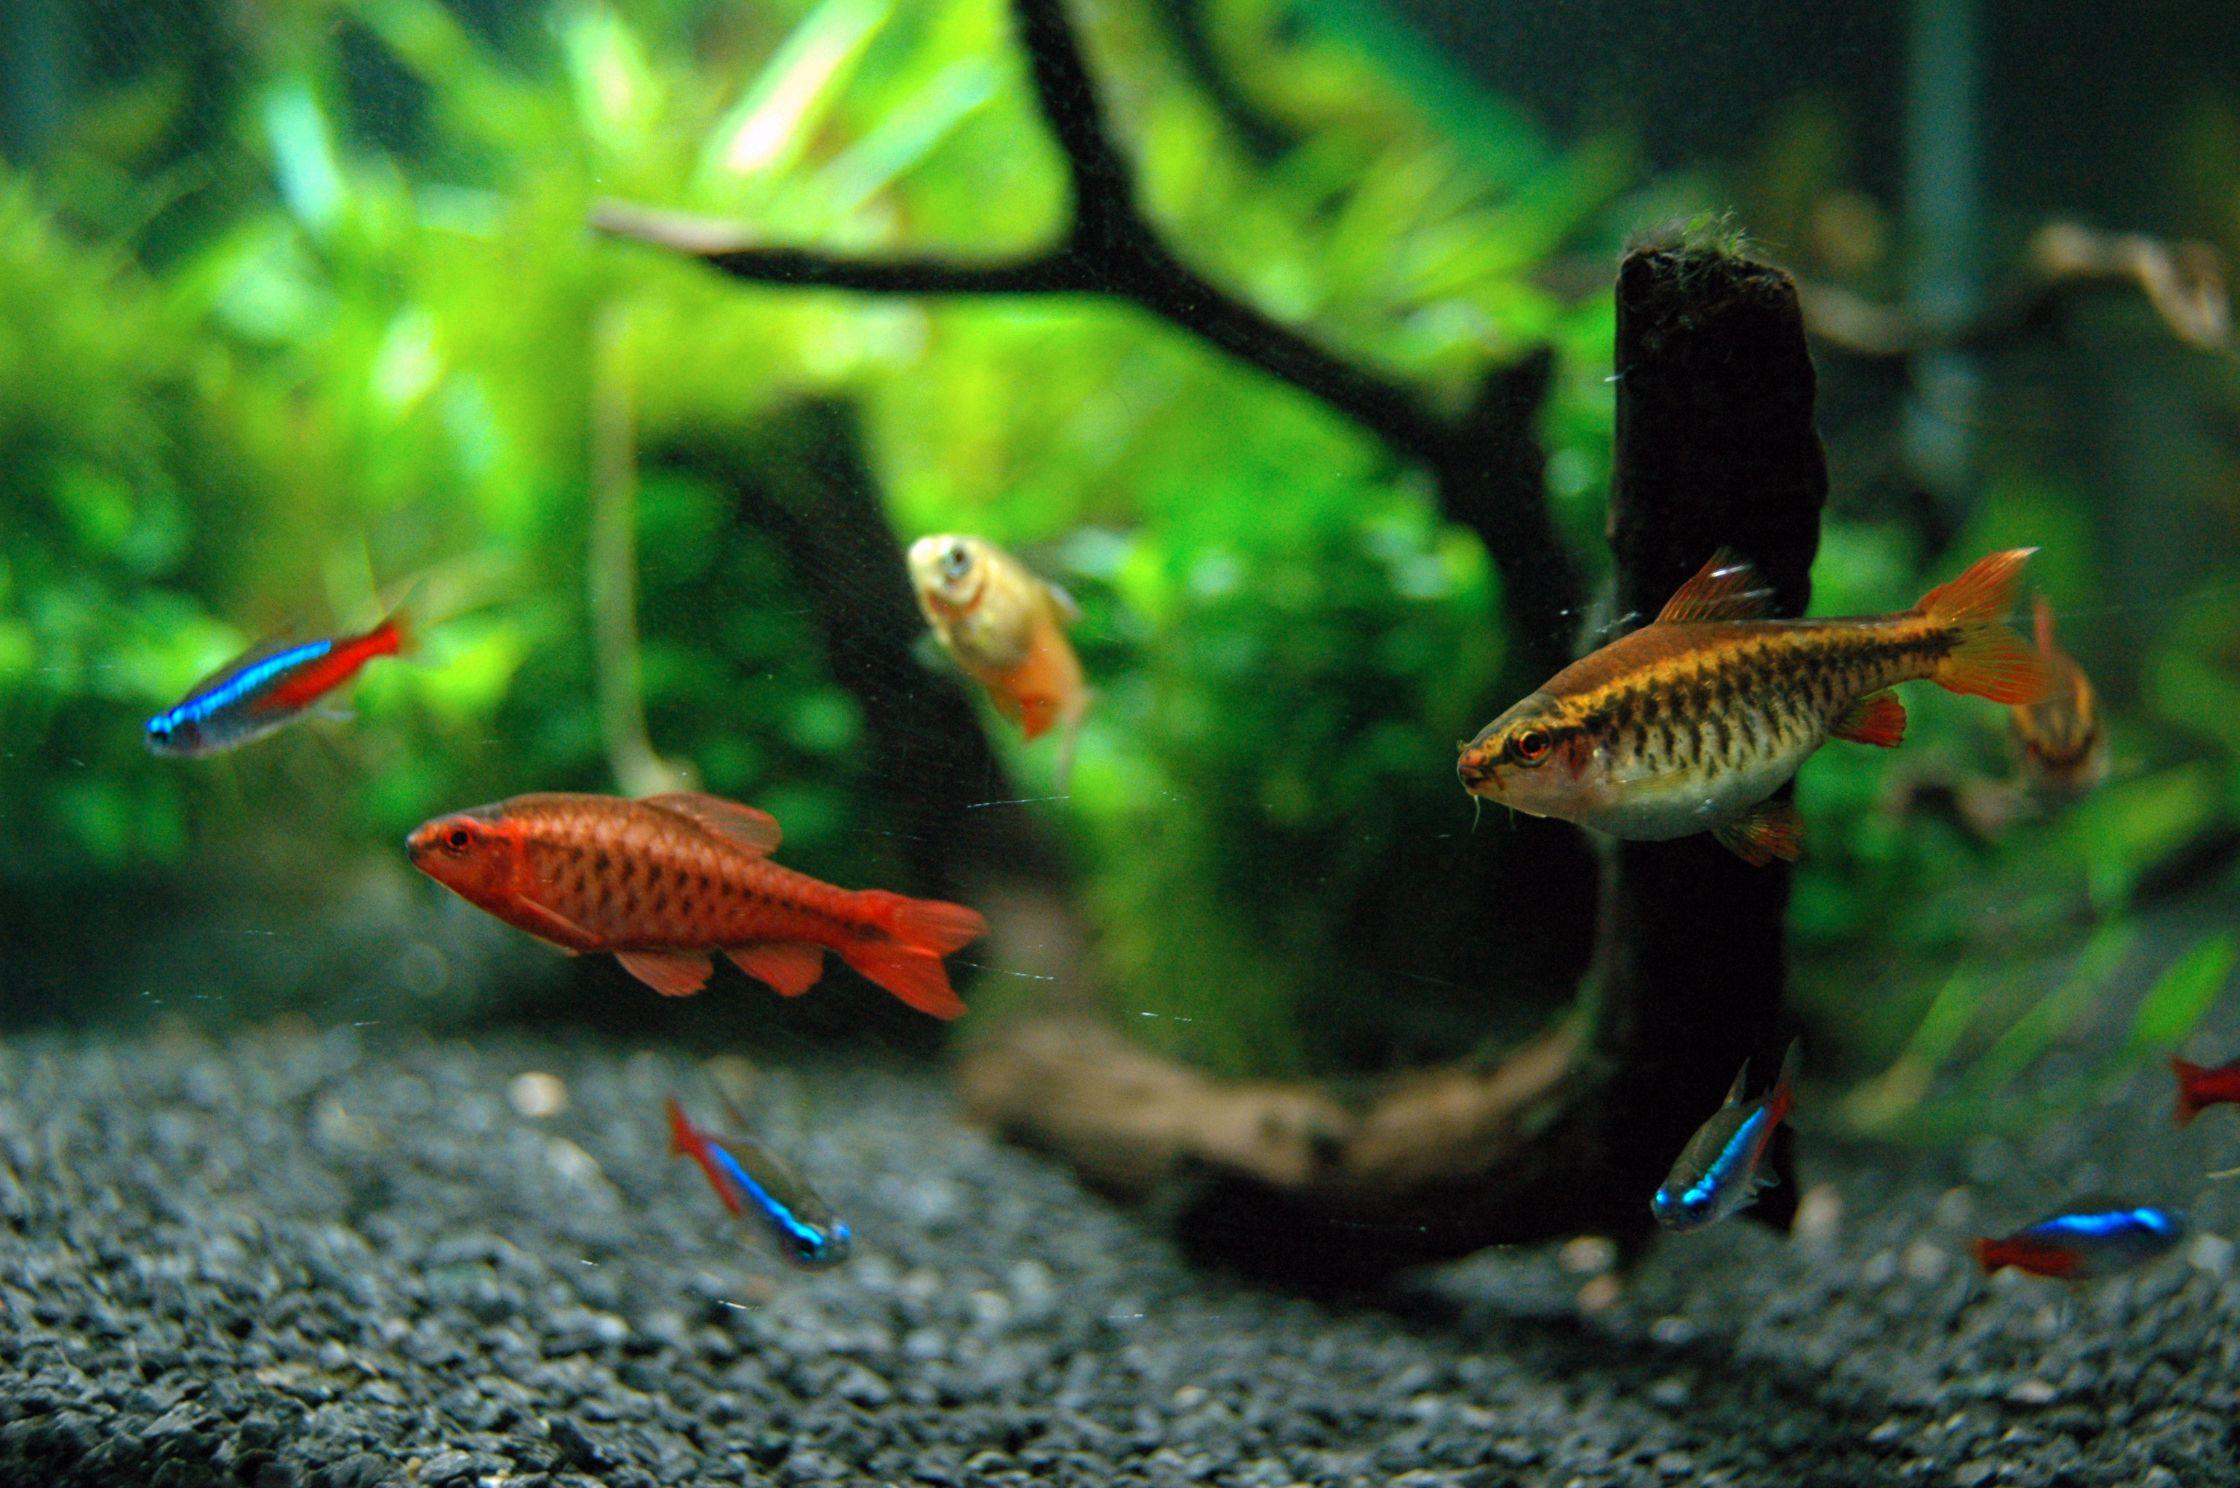 aquarium fish in outdoor fountains and ponds